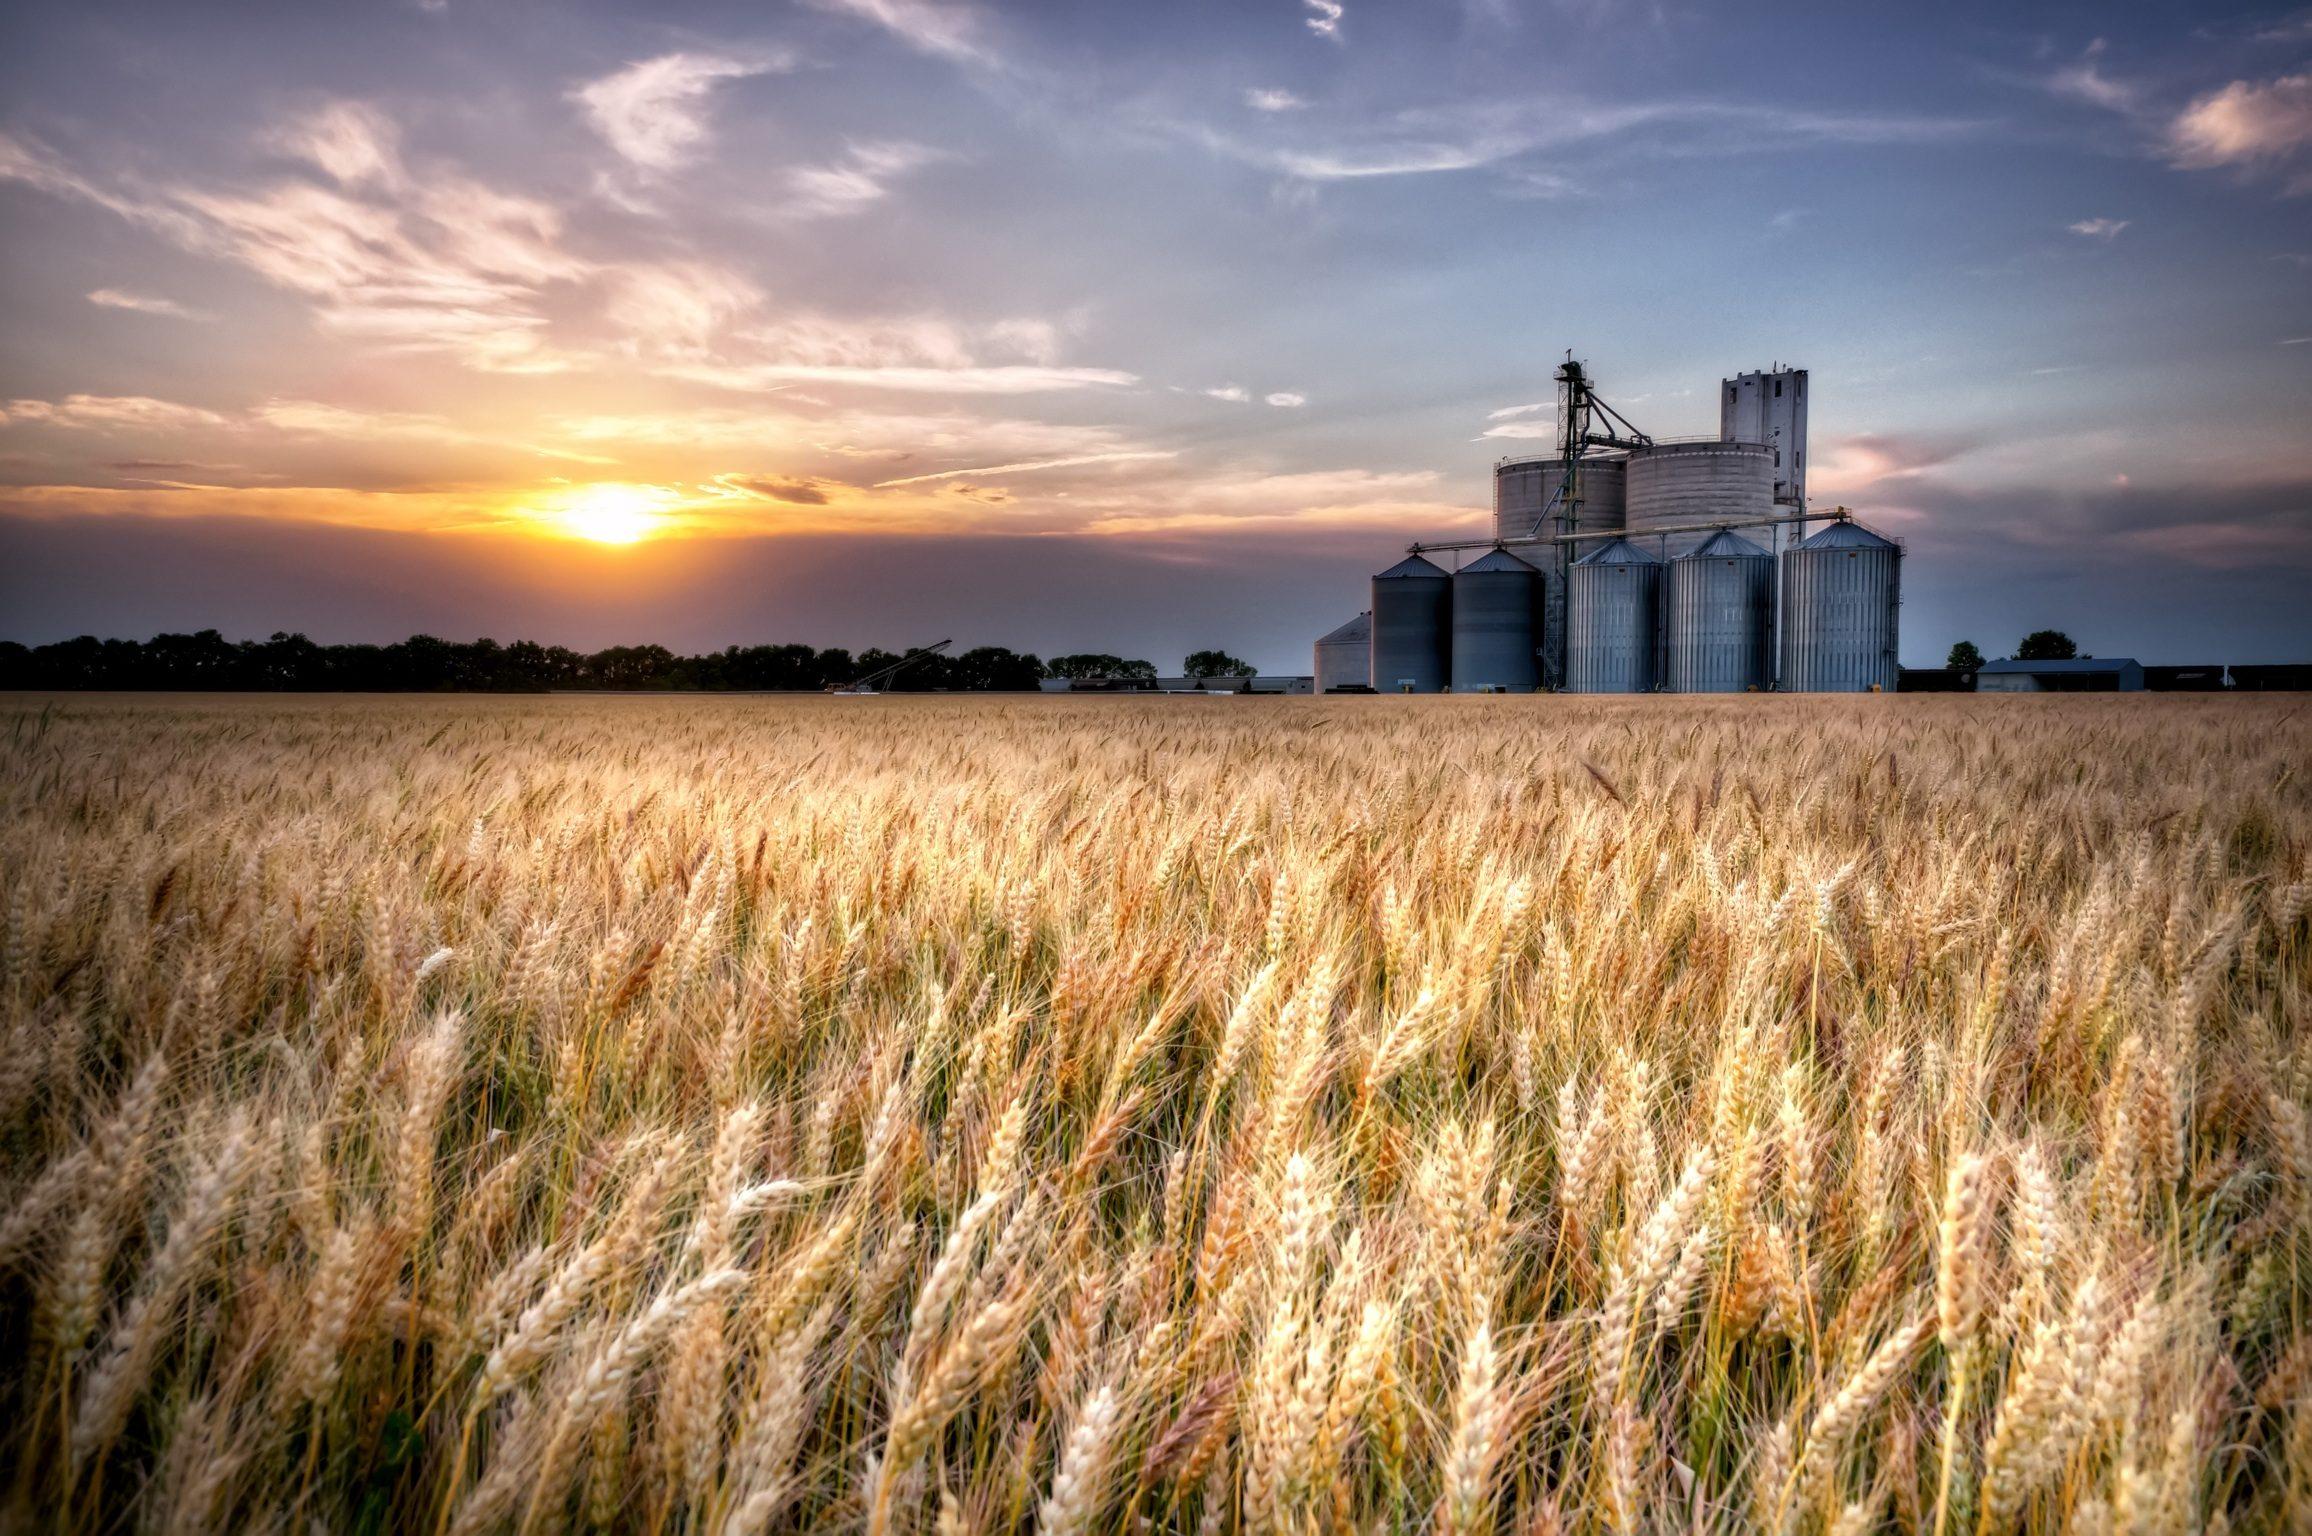 How Do We Value Nature? Market Breakdowns and Technological Bridges